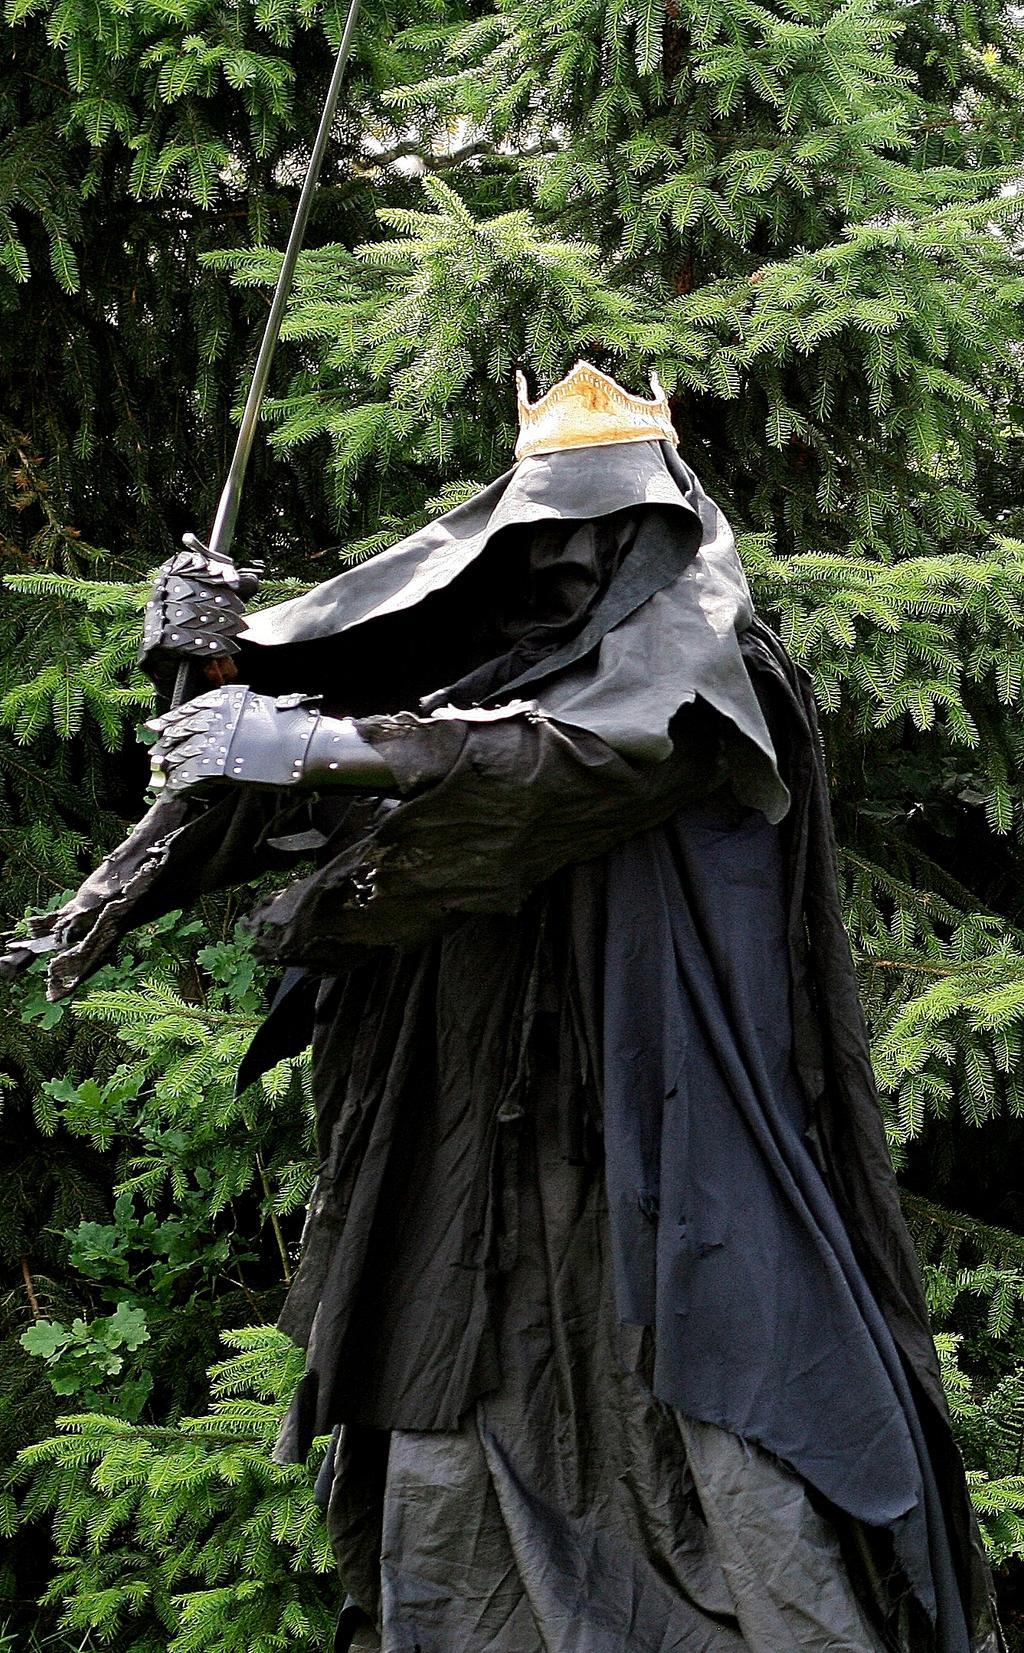 Black Death 17 by Dewfooter